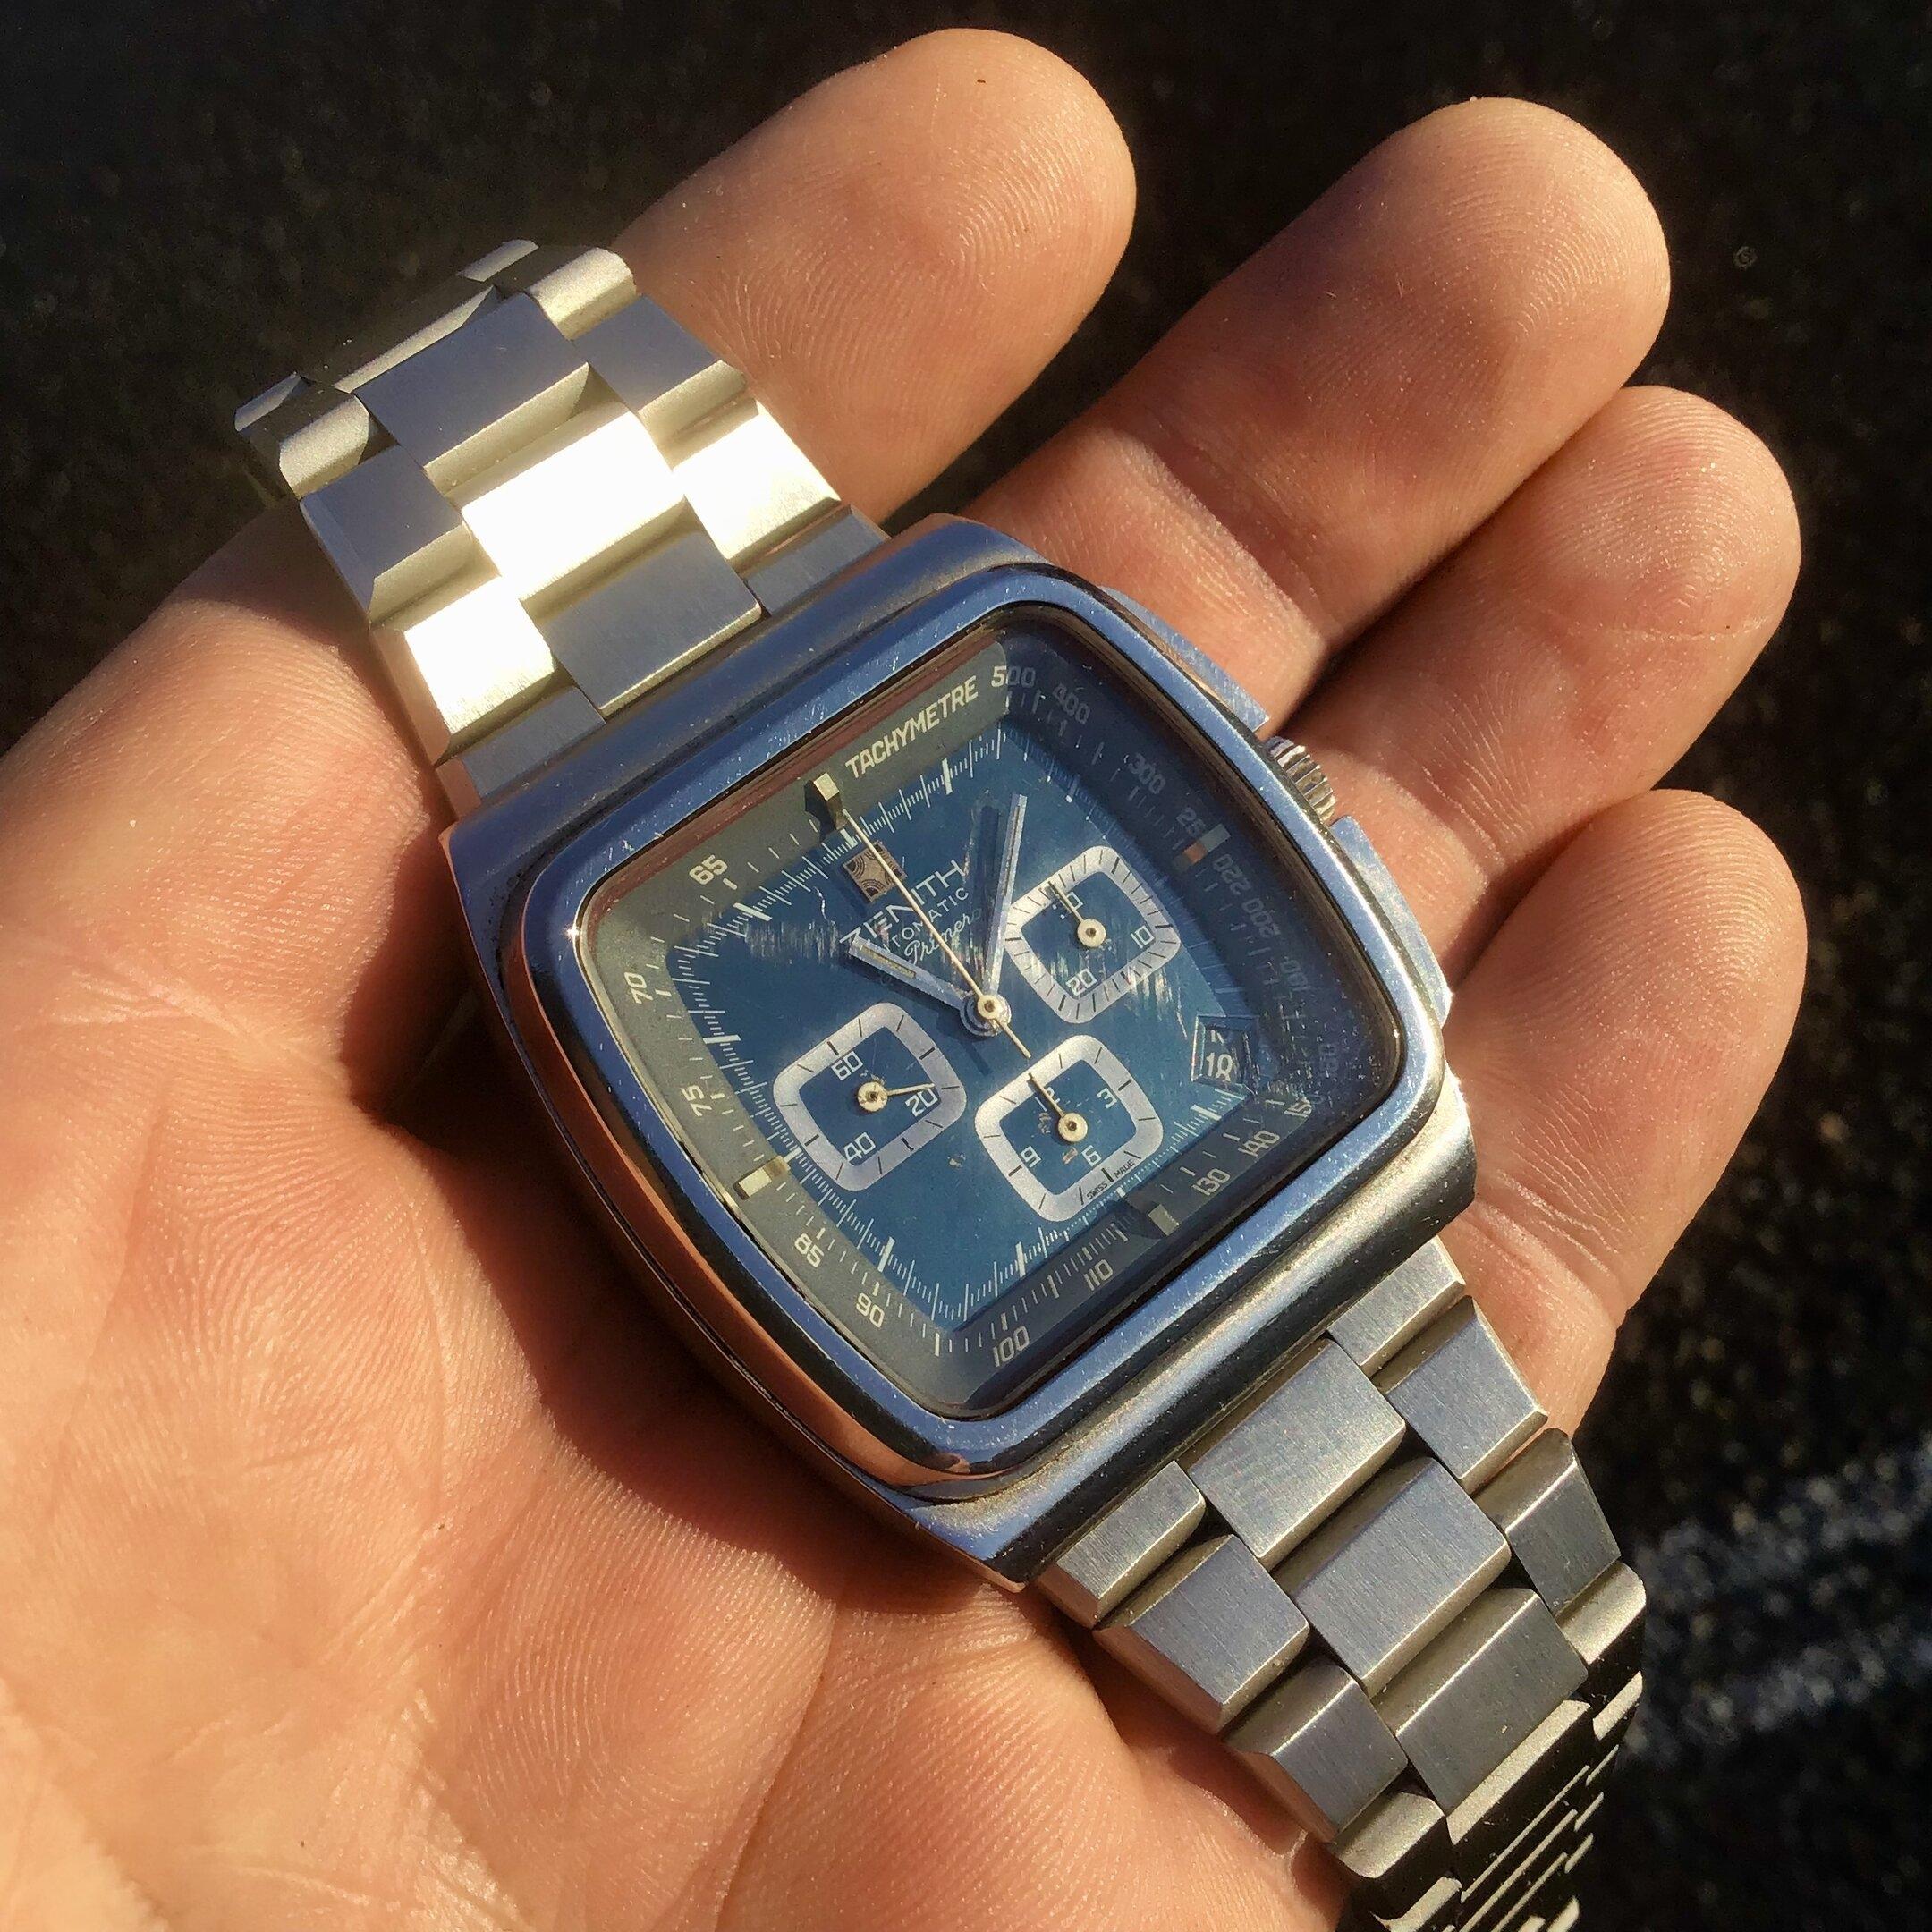 1291B9E8-94CC-40AD-85A1-A5EE439CD13C.jpeg